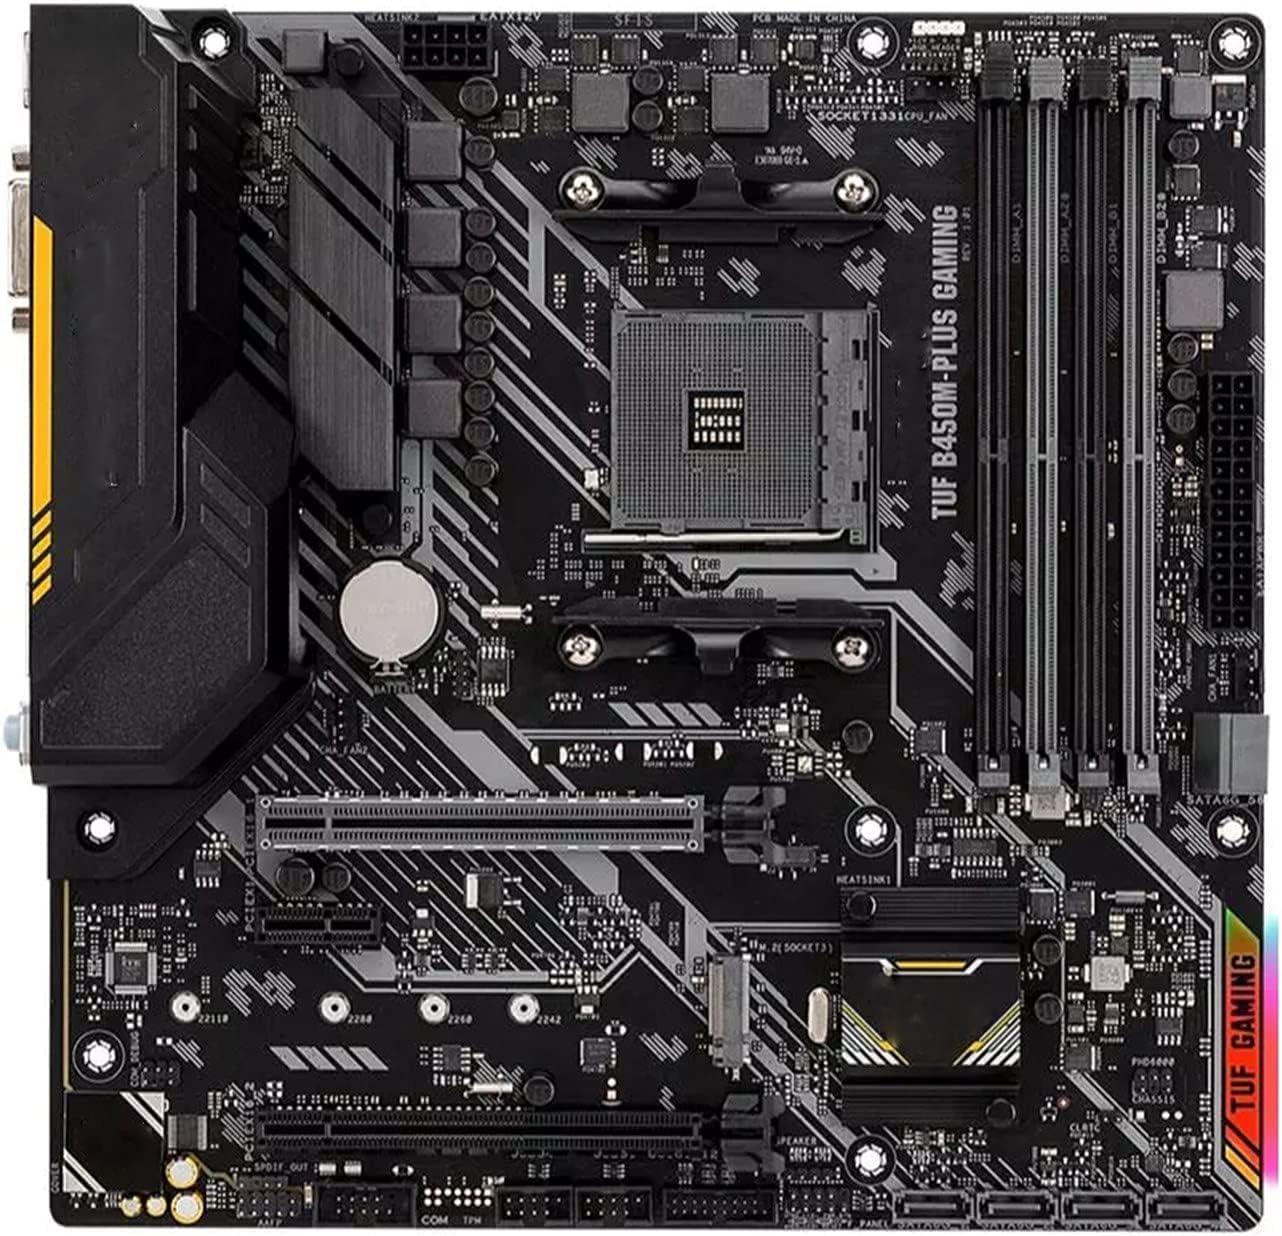 SYFANG Fit for ASUS TUF B450M-PLUS Gaming Placa Base DDR4 M.2 AMD Ryzen Desktop B450 AM4 Placa Base para Juegos(Color:A)